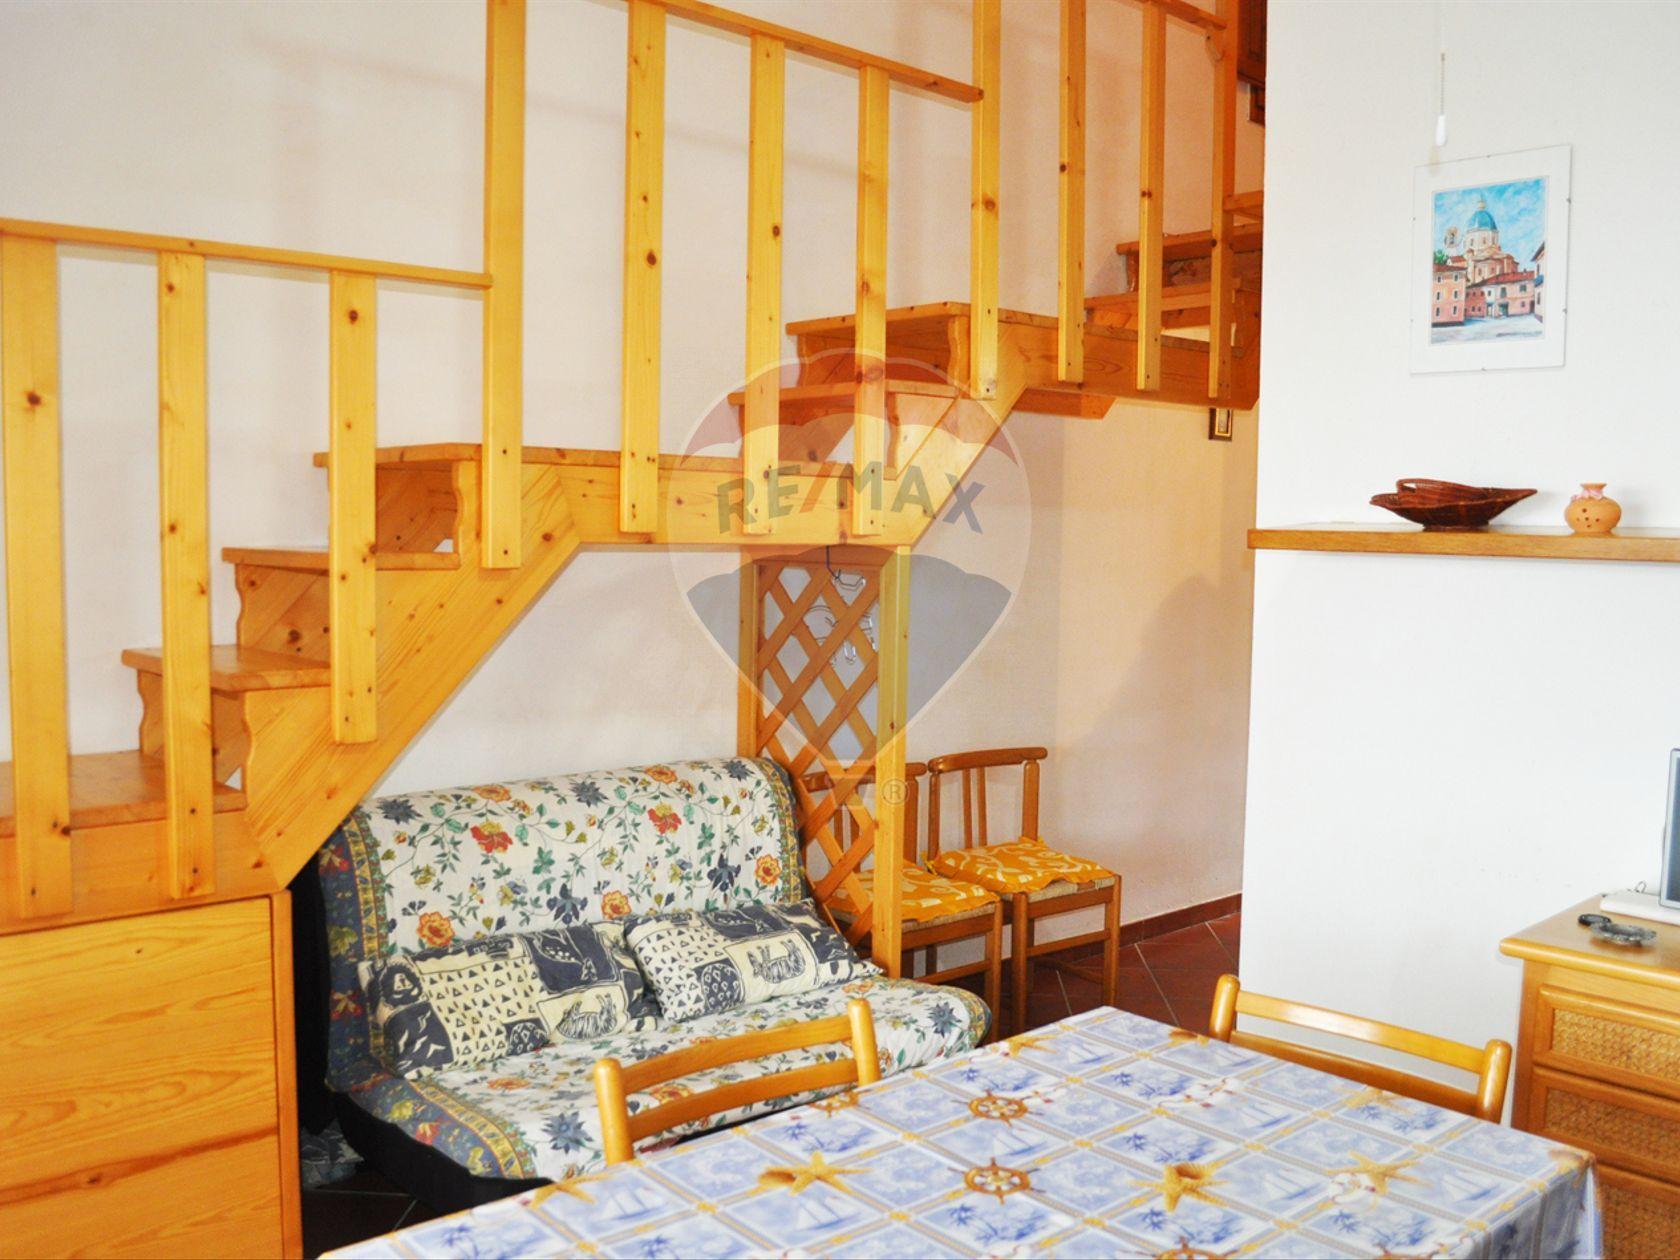 Appartamento Portu Maga, Arbus, VS Vendita - Foto 9